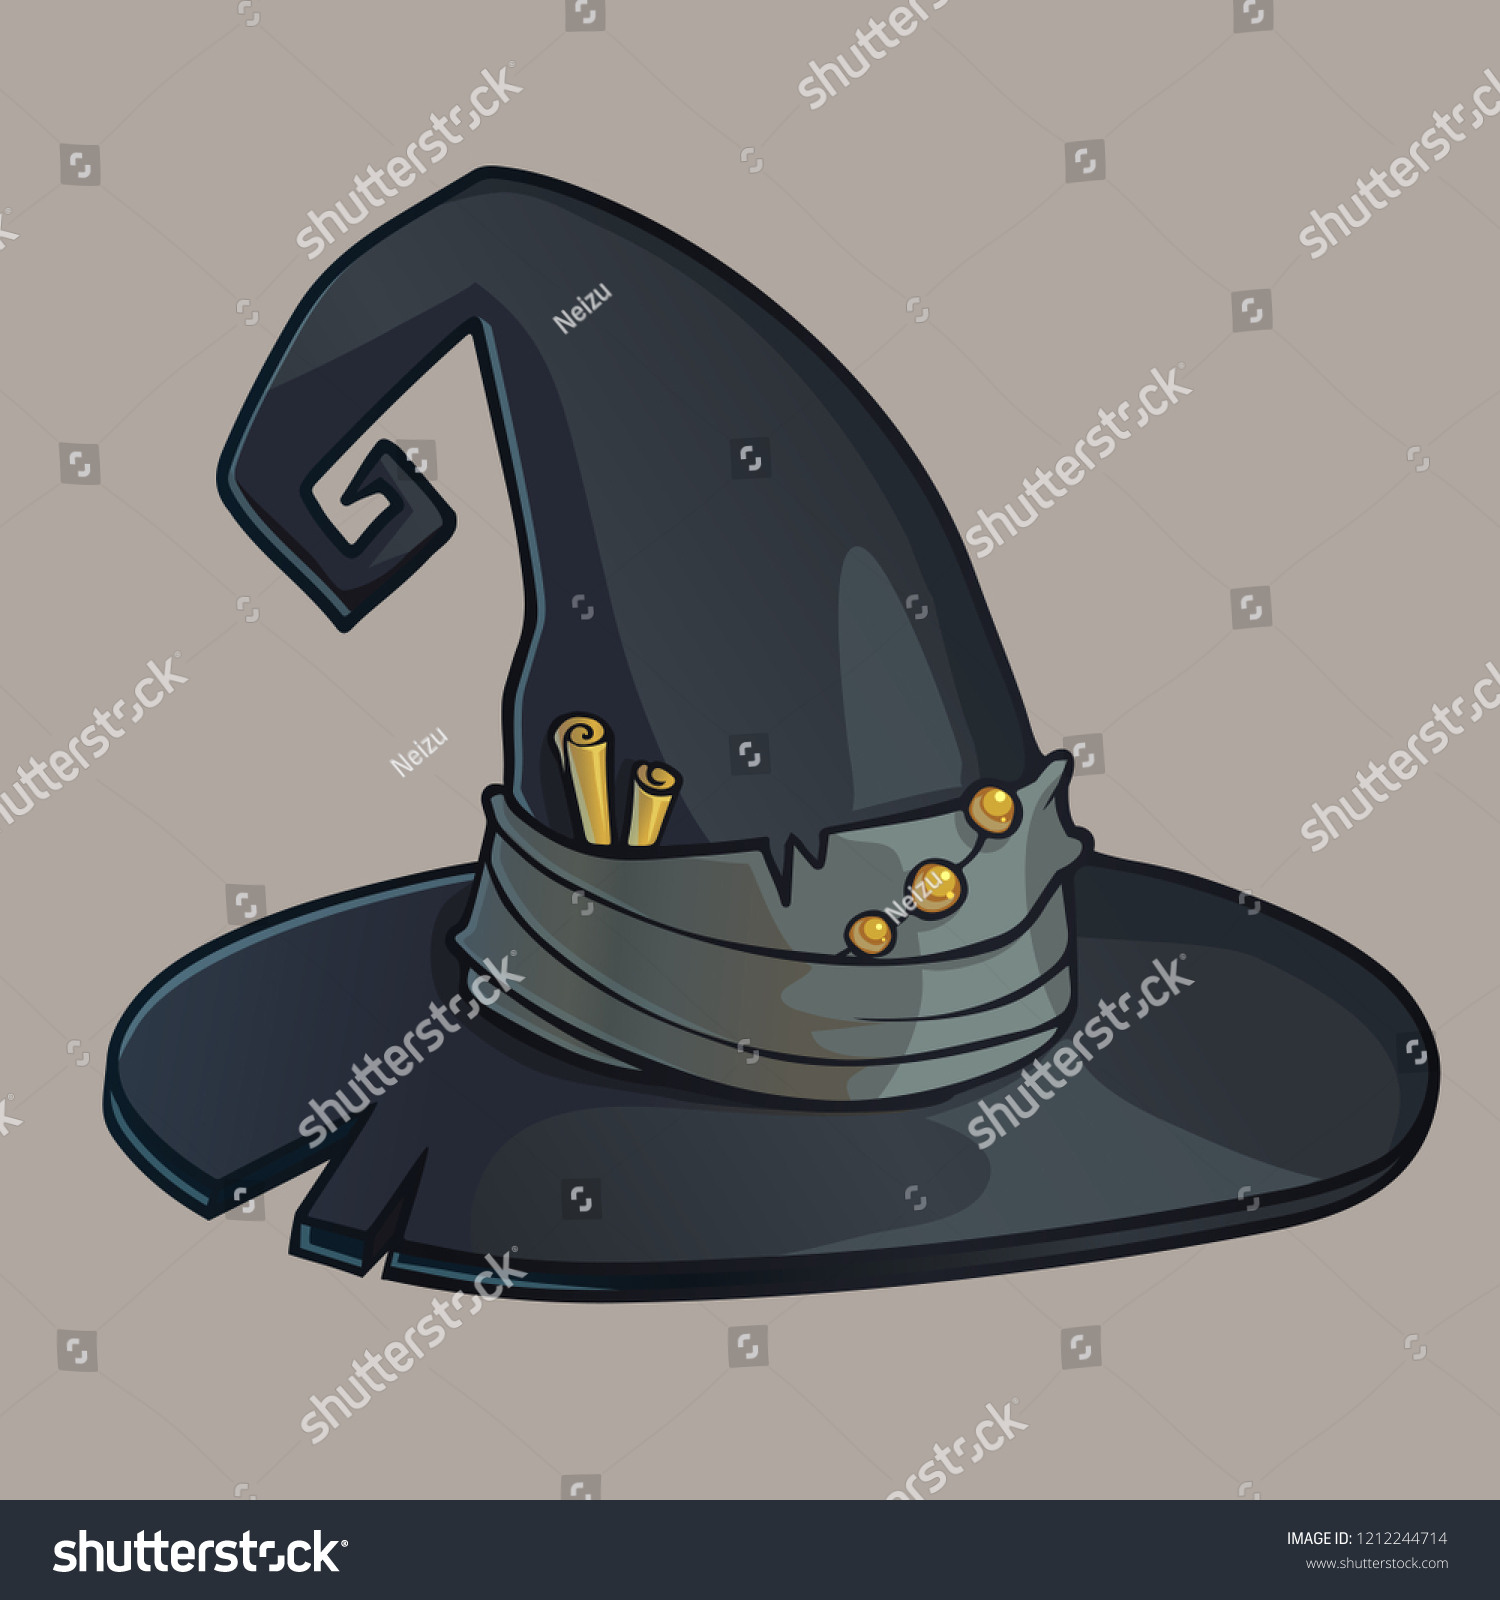 Black witch hat. Vector color illustration of old magical wide-brimmed hat ad614c587c9